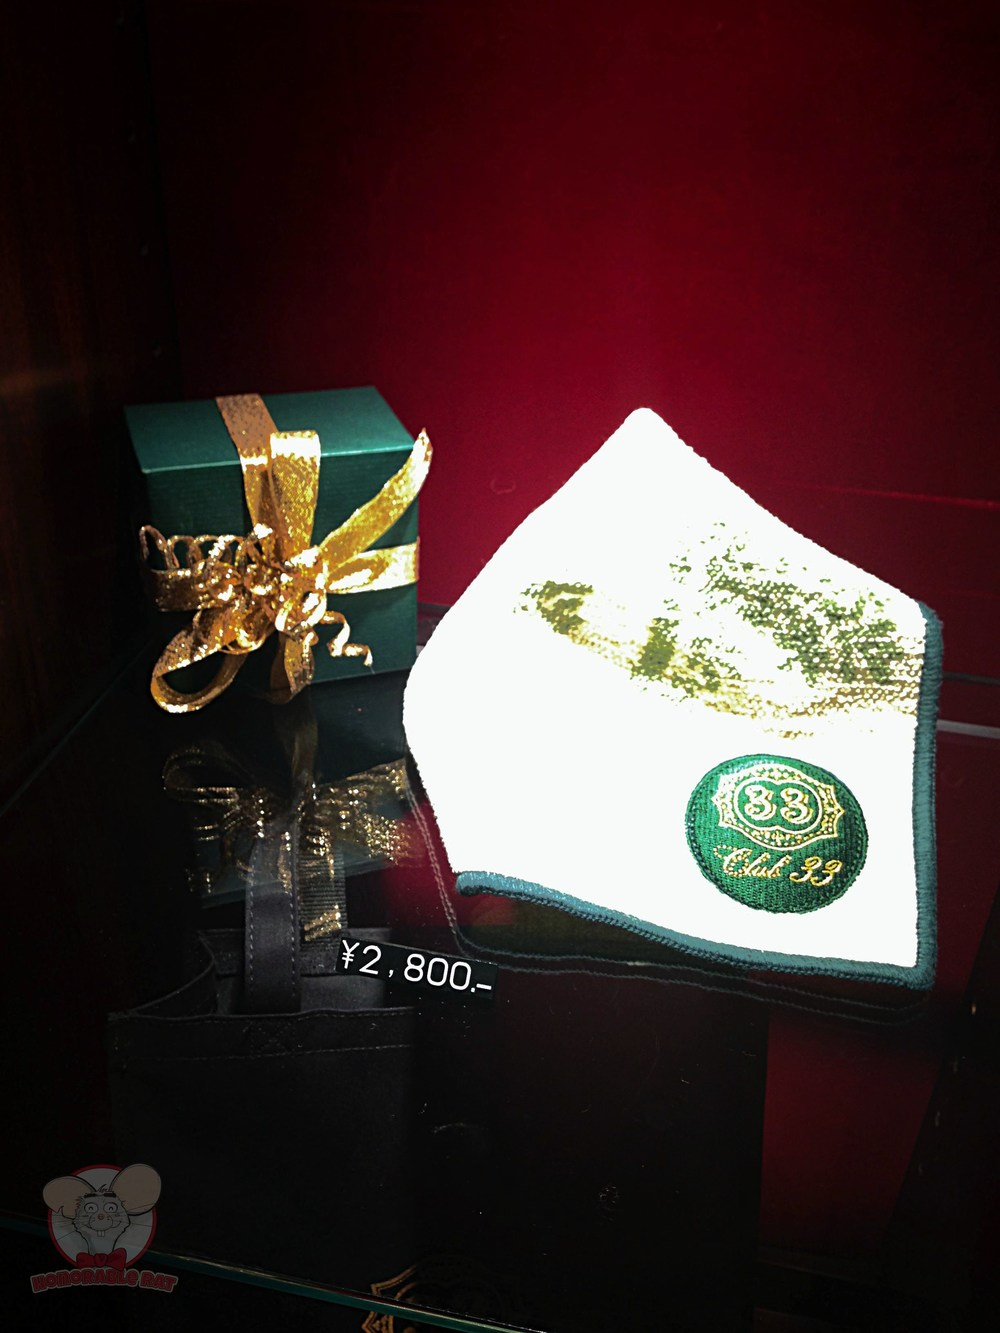 Club 33 Handkerchief